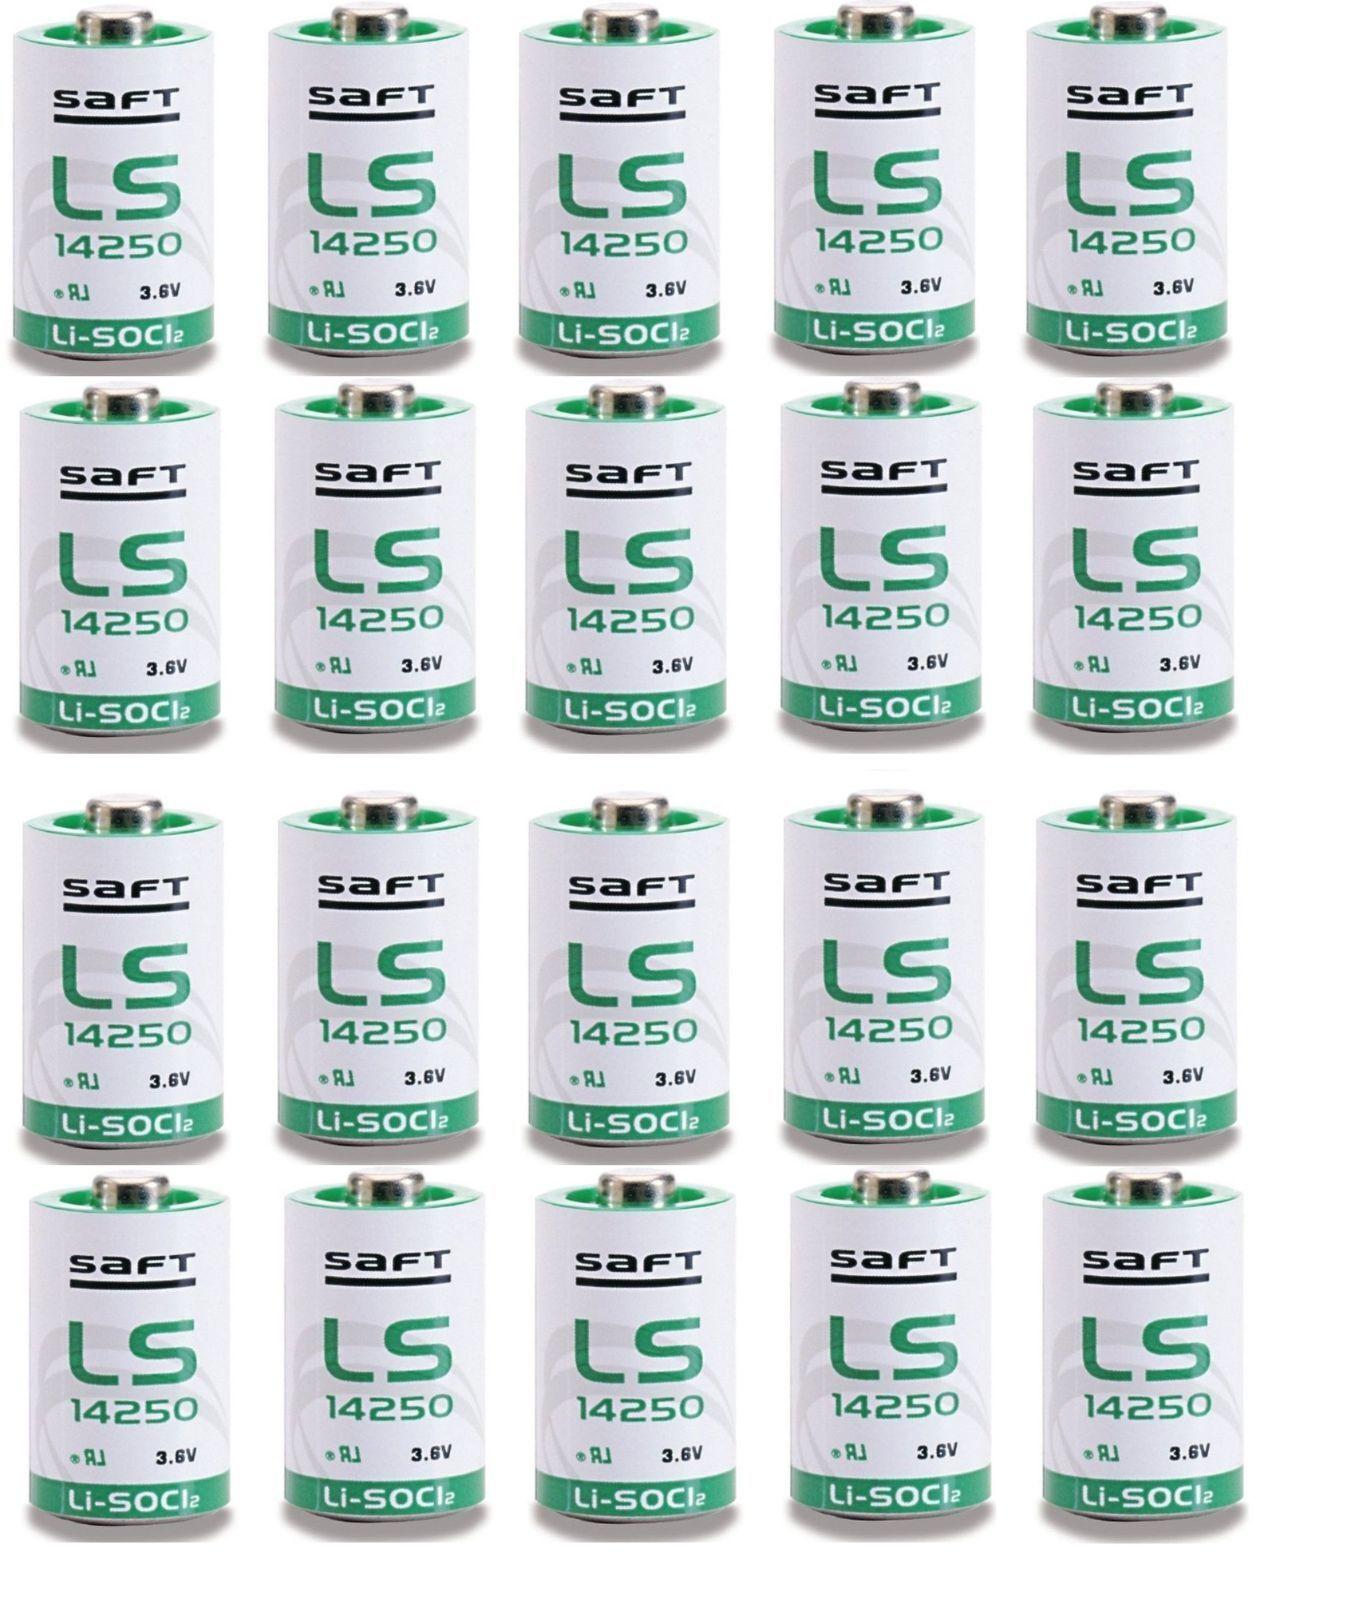 20 Saft Lithium Batteries ls14250 1/2 AA Half Stylus SAFT 3.6v Li